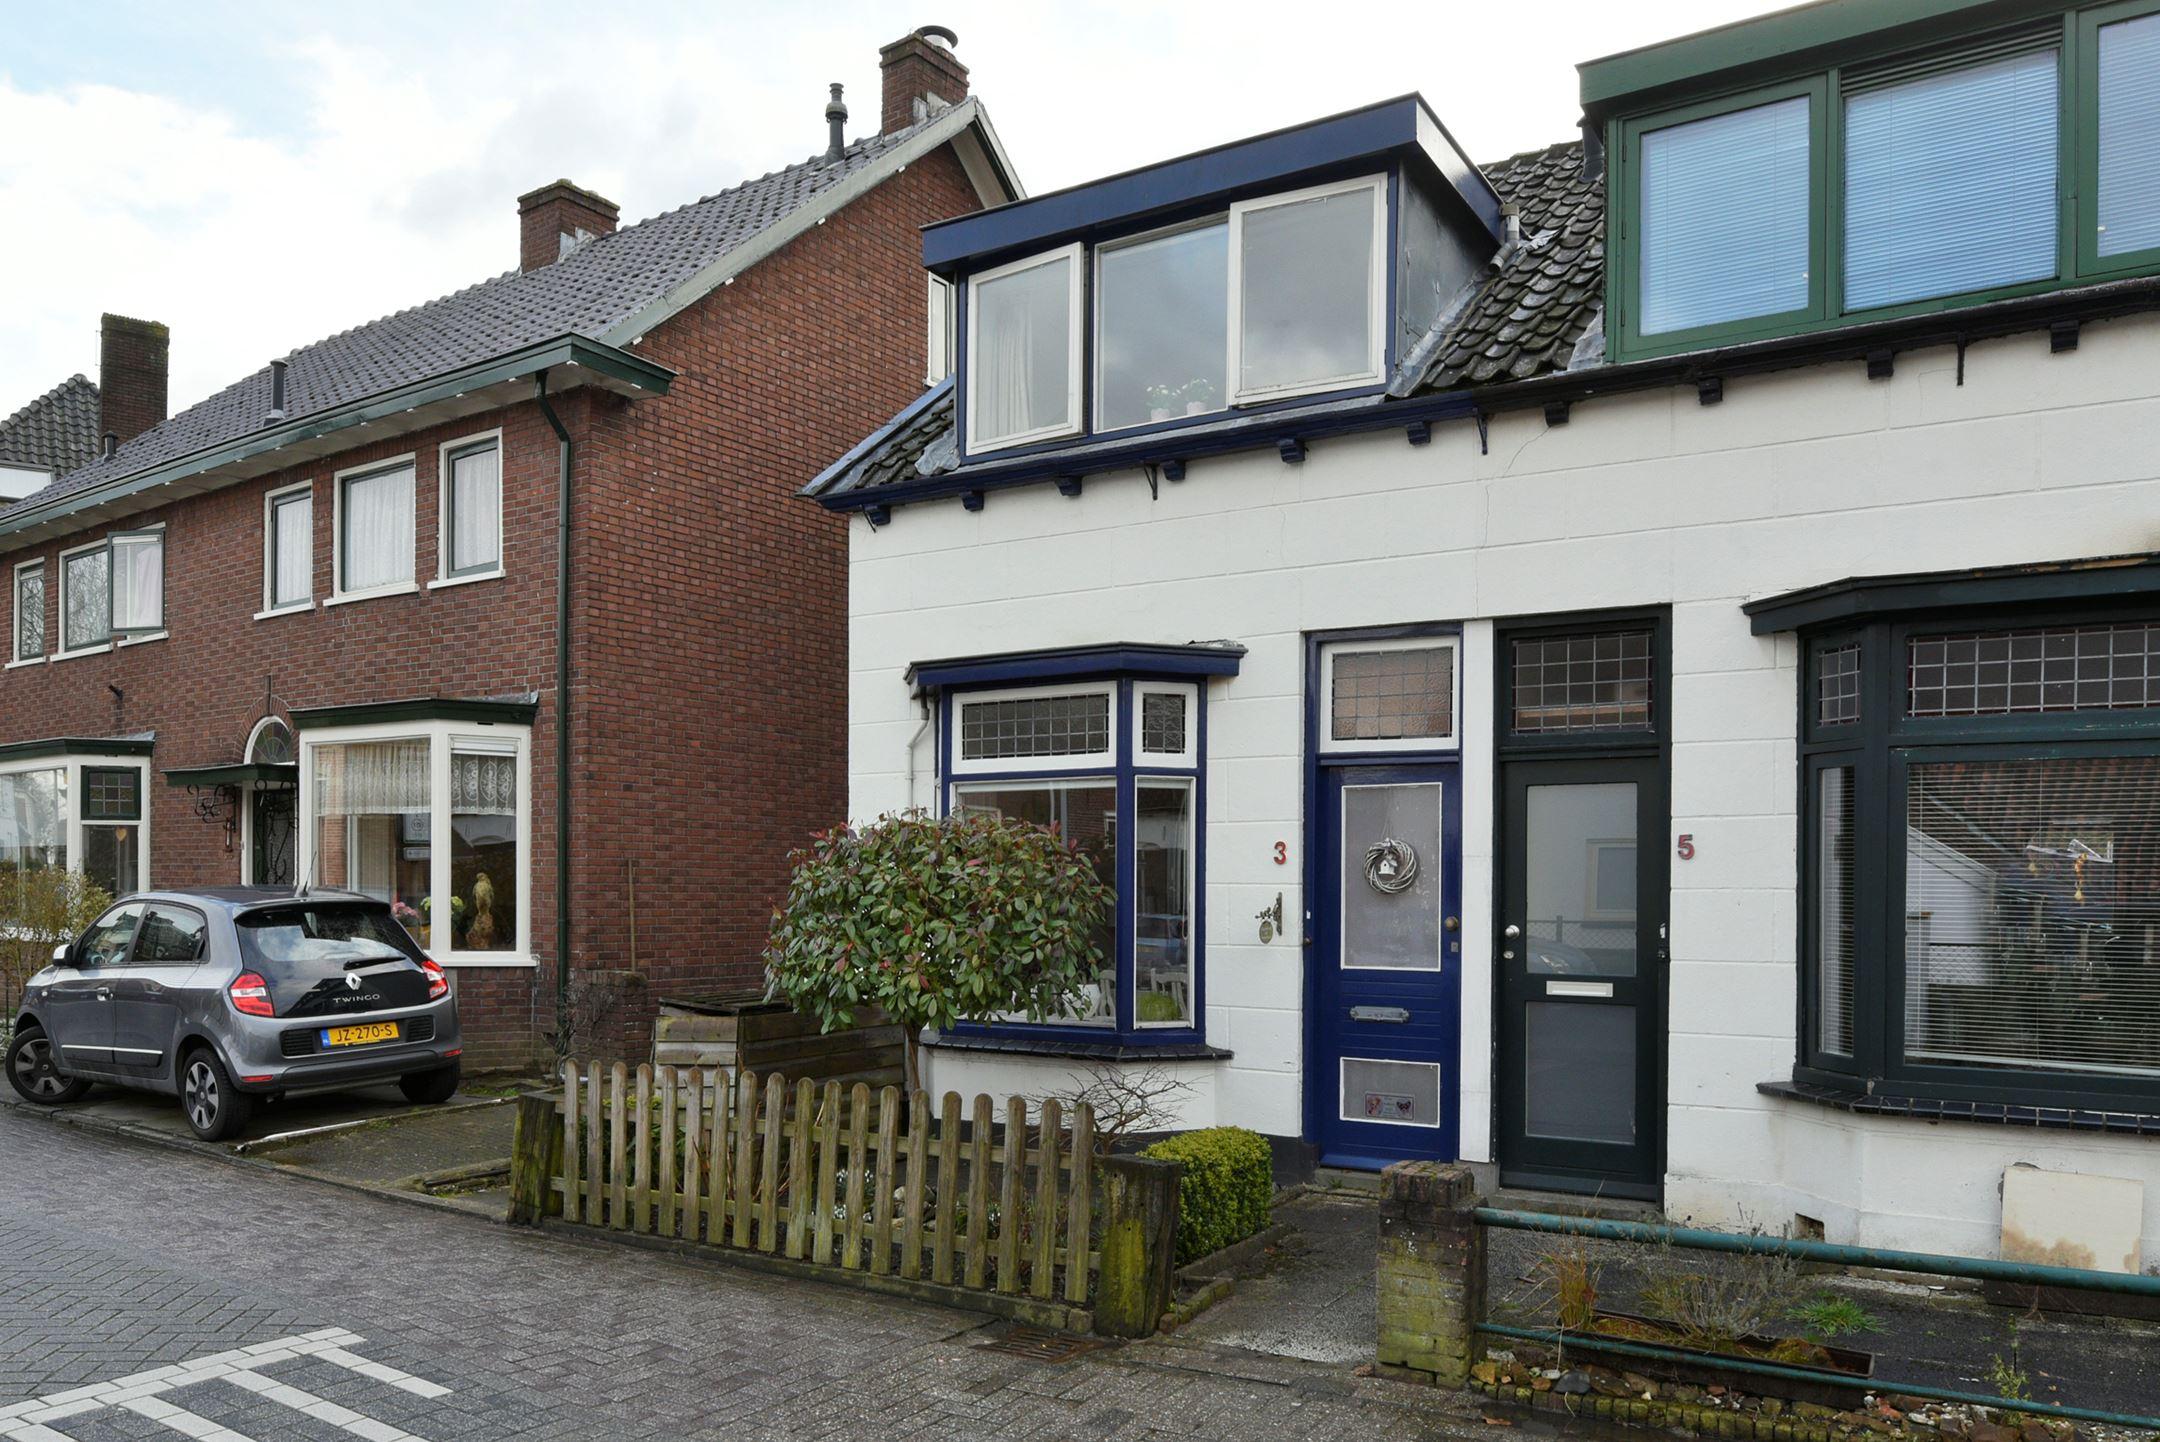 huis te koop baankstraat 3 7205 at zutphen funda